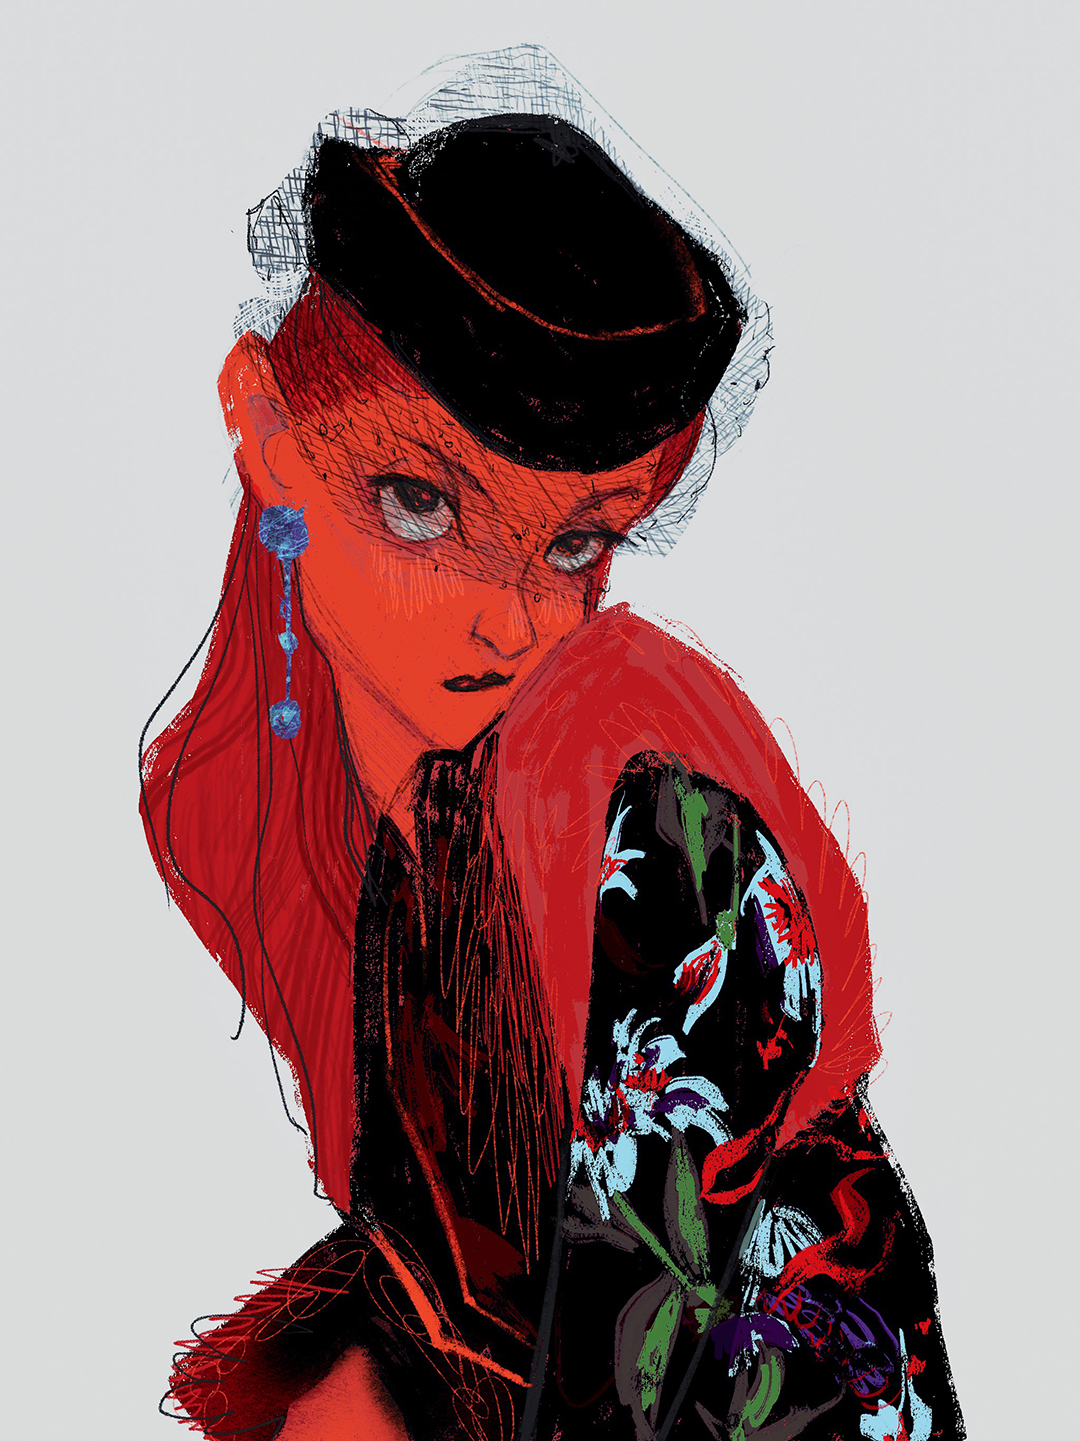 GirlsclubAsia-AGirlsclubAsia-Artist-Yuuki Jia Artworks 09rtist-Yuuki Jia Artworks 10